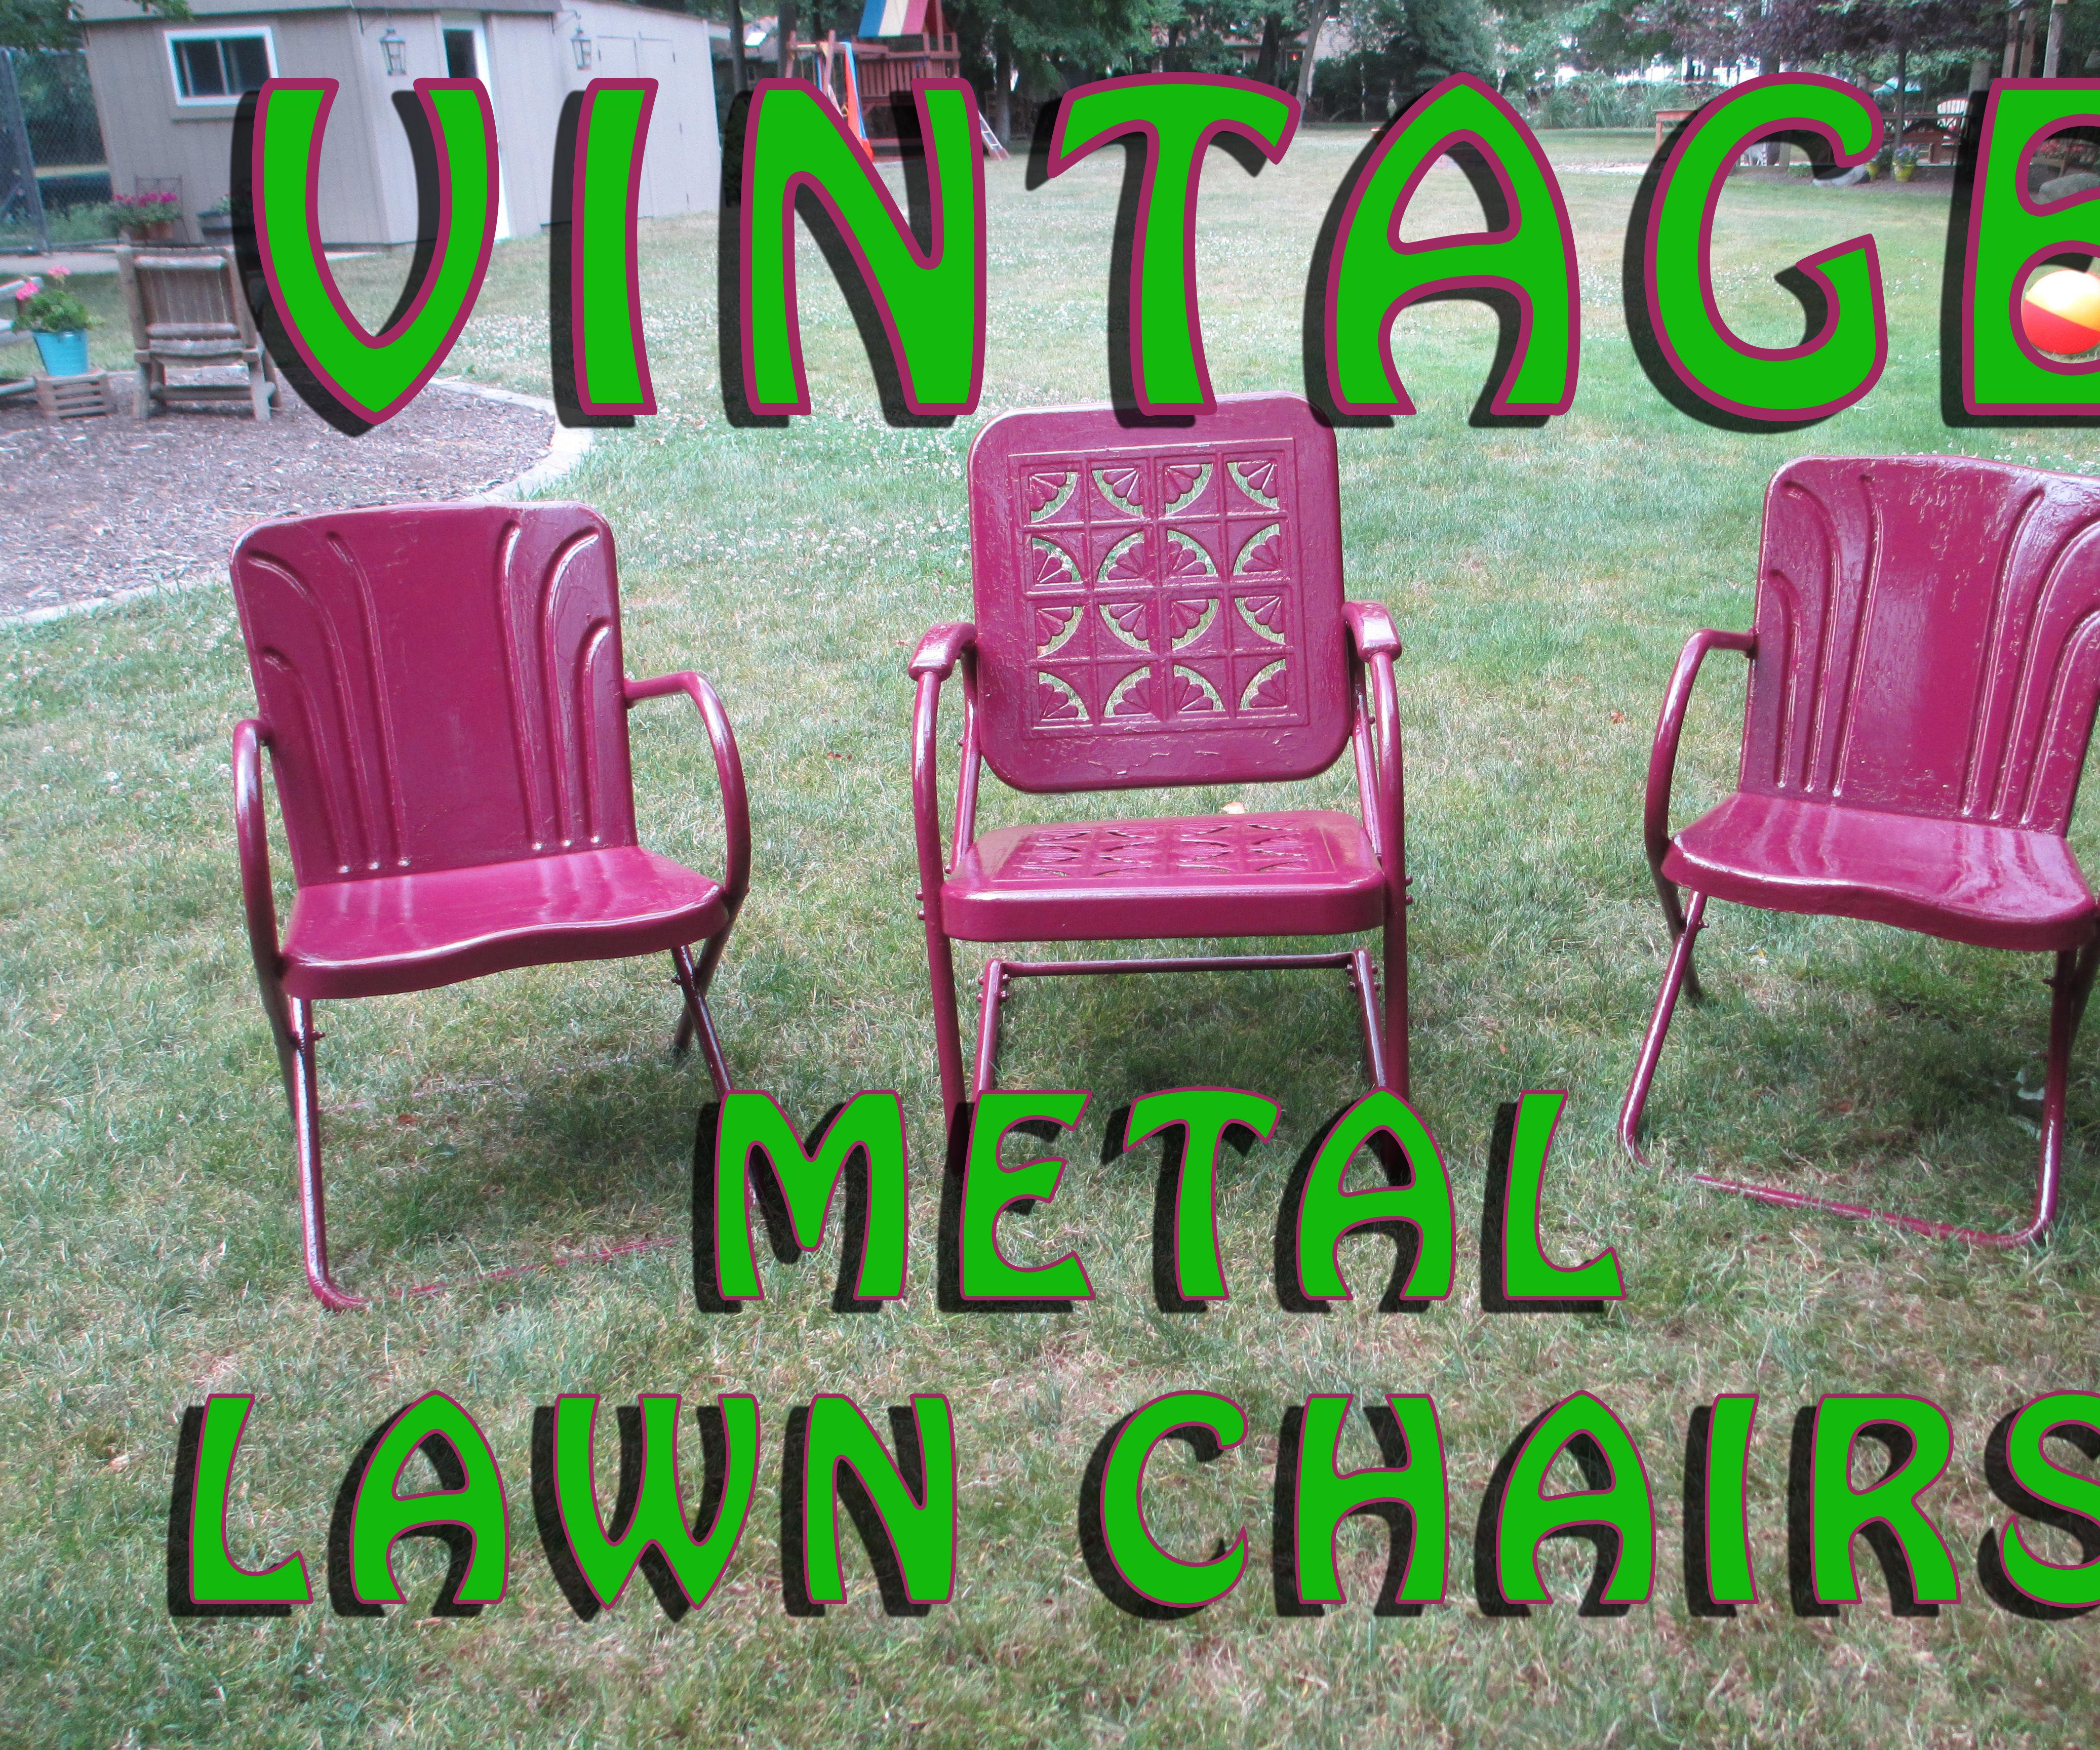 Vintage Metal Lawn Chairs >> Cdn Instructables Com Orig F8r 22uq Iqb753je F8r22